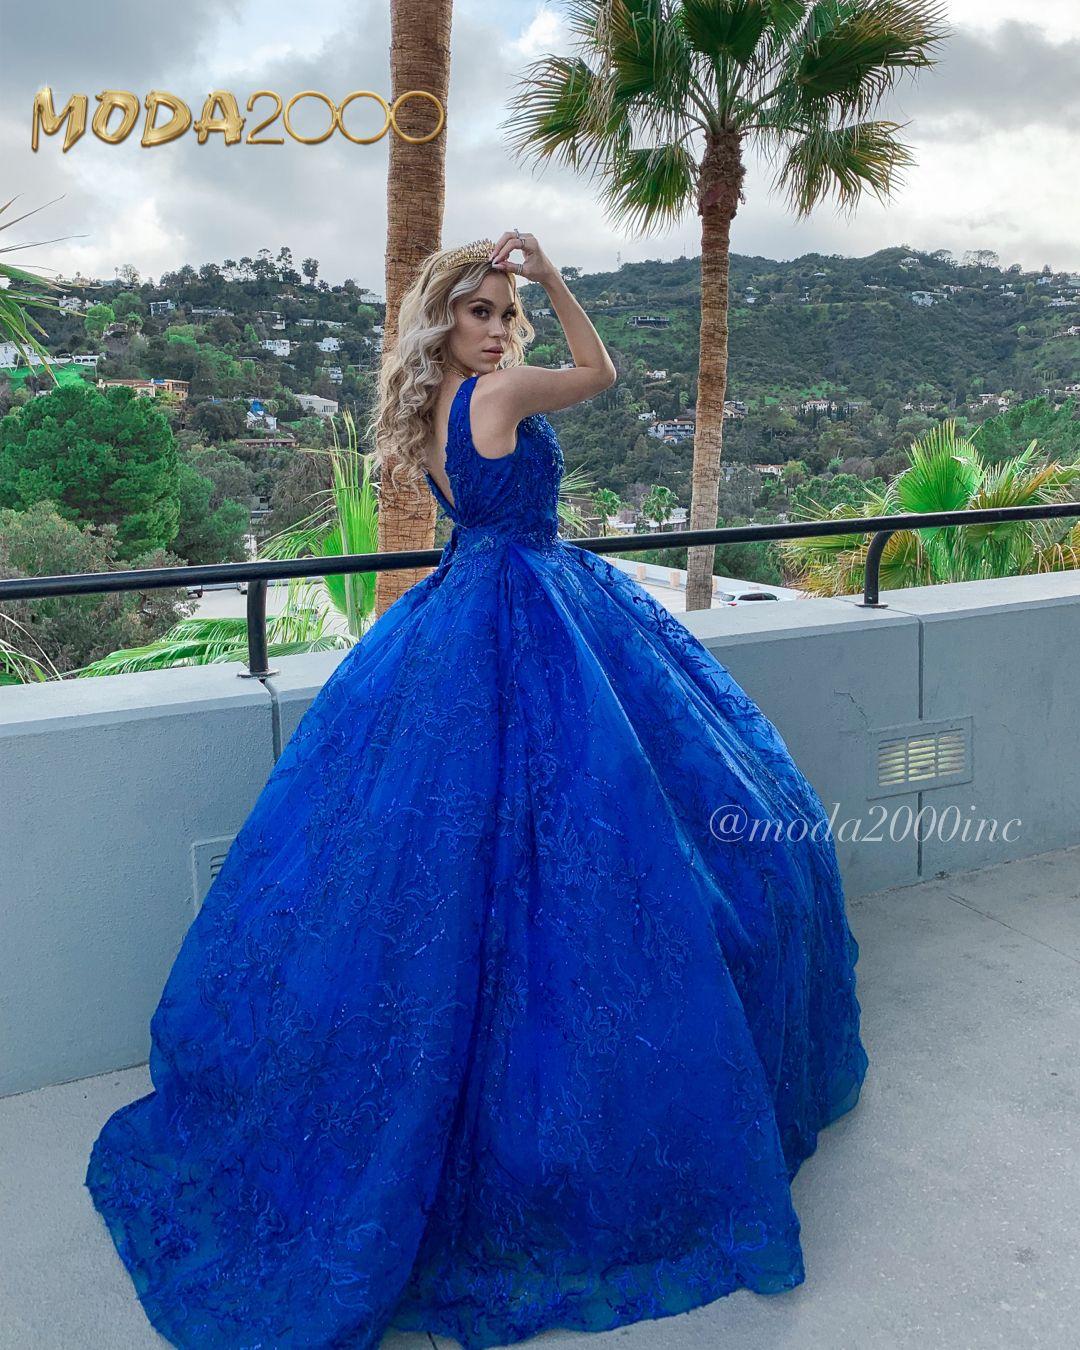 Royal Blue V Neckline Quinceanera Dress Quinceanera Dresses Quinceanera Dresses Blue Pretty Quinceanera Dresses [ 1350 x 1080 Pixel ]